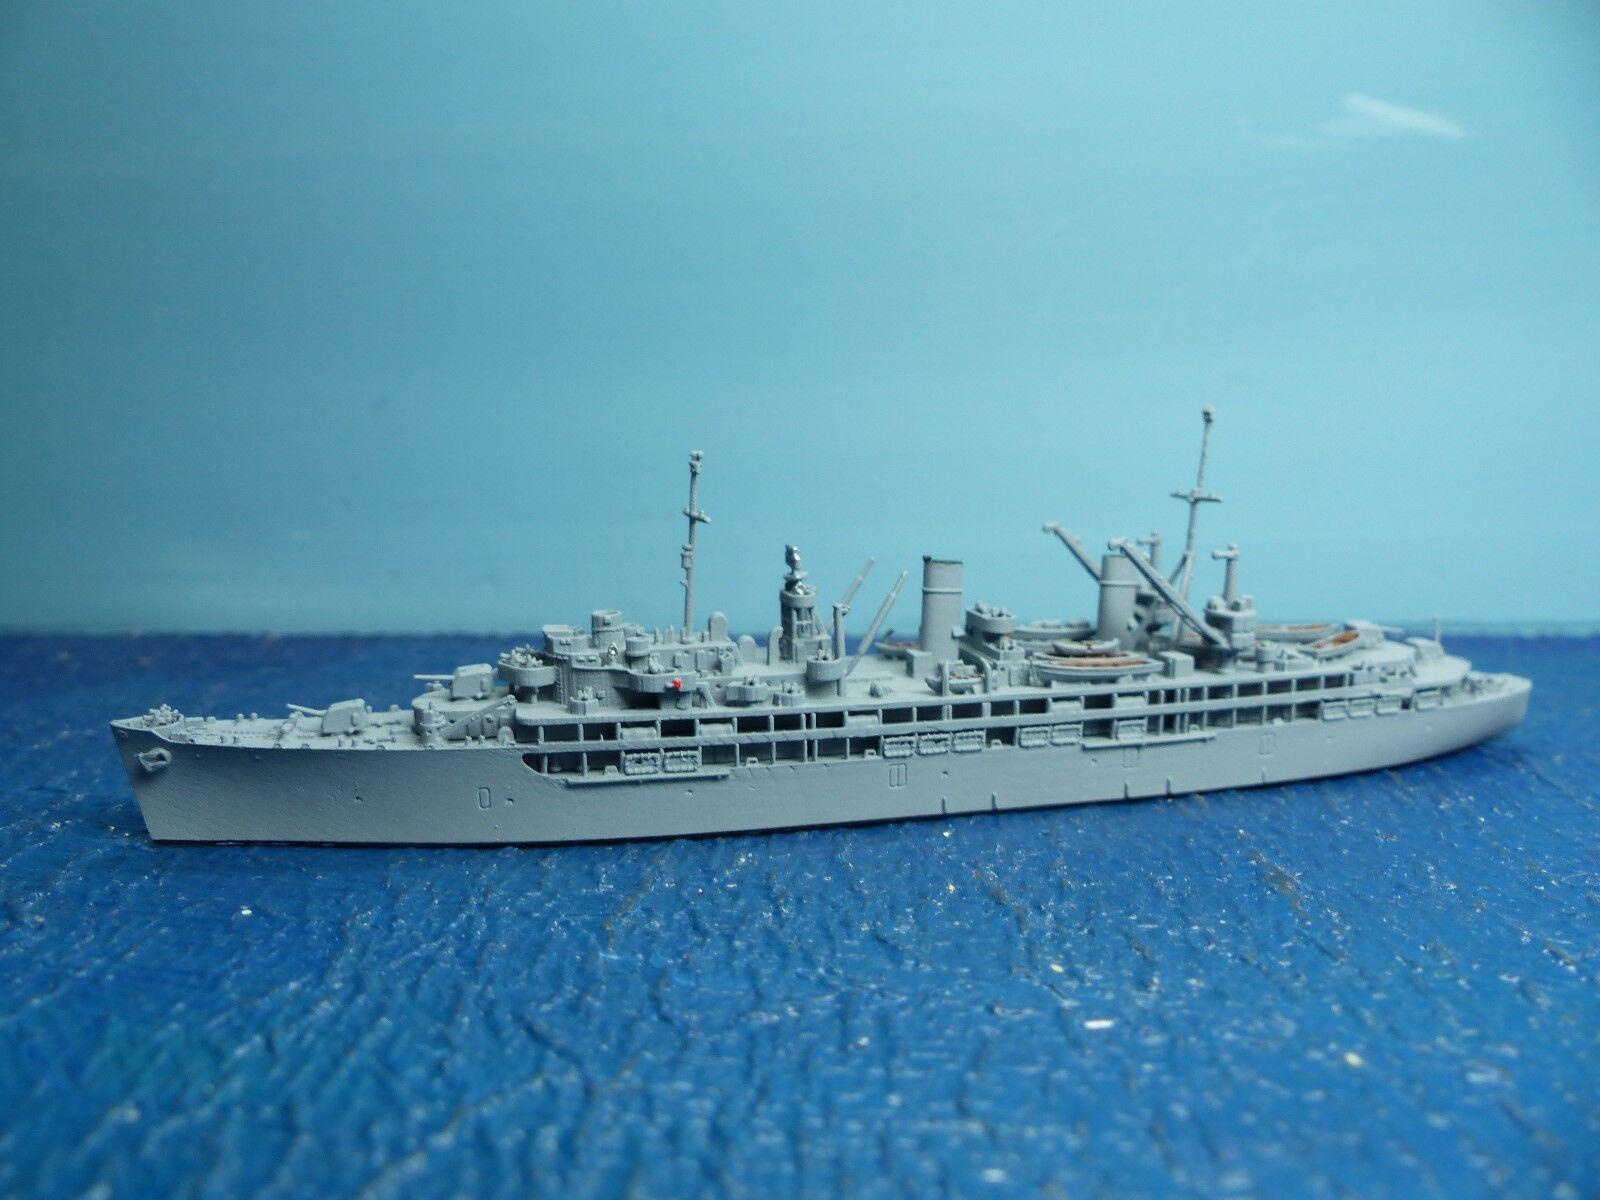 Spidernavy barco 1 1250 EE. UU. tender  uss Piedmont  SN 2-09 novedad